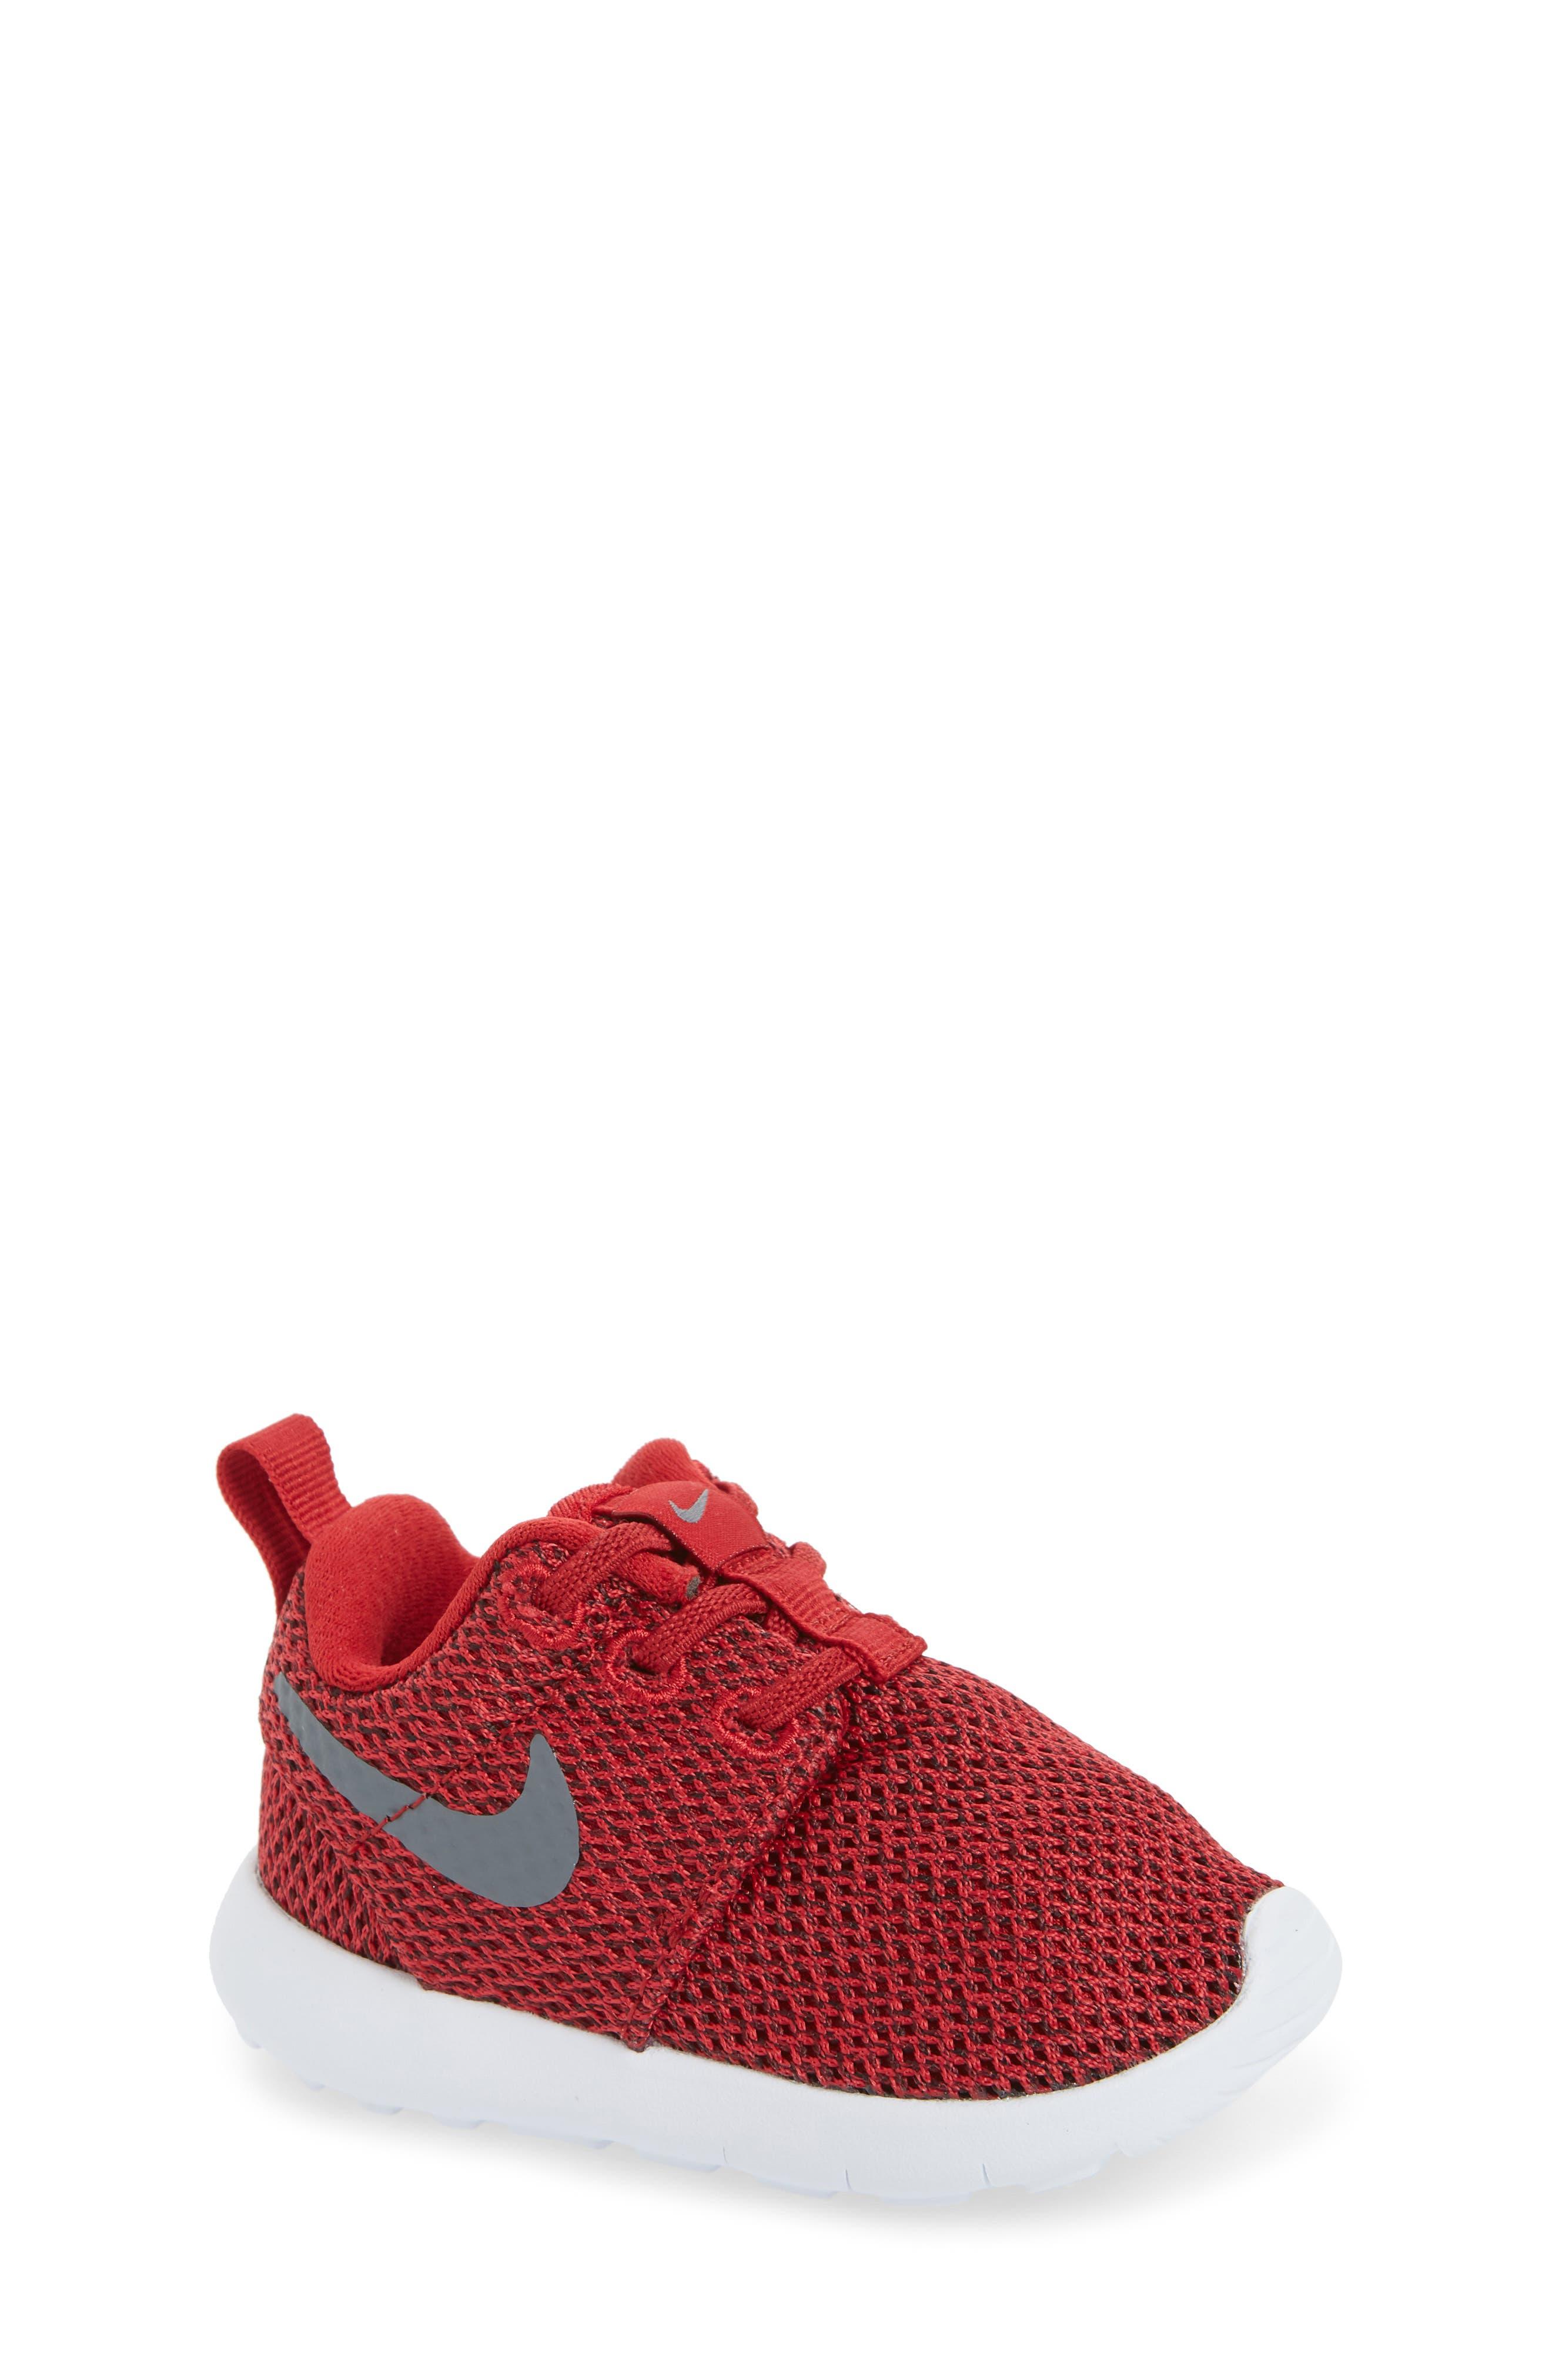 'Roshe Run' Sneaker,                             Main thumbnail 1, color,                             608